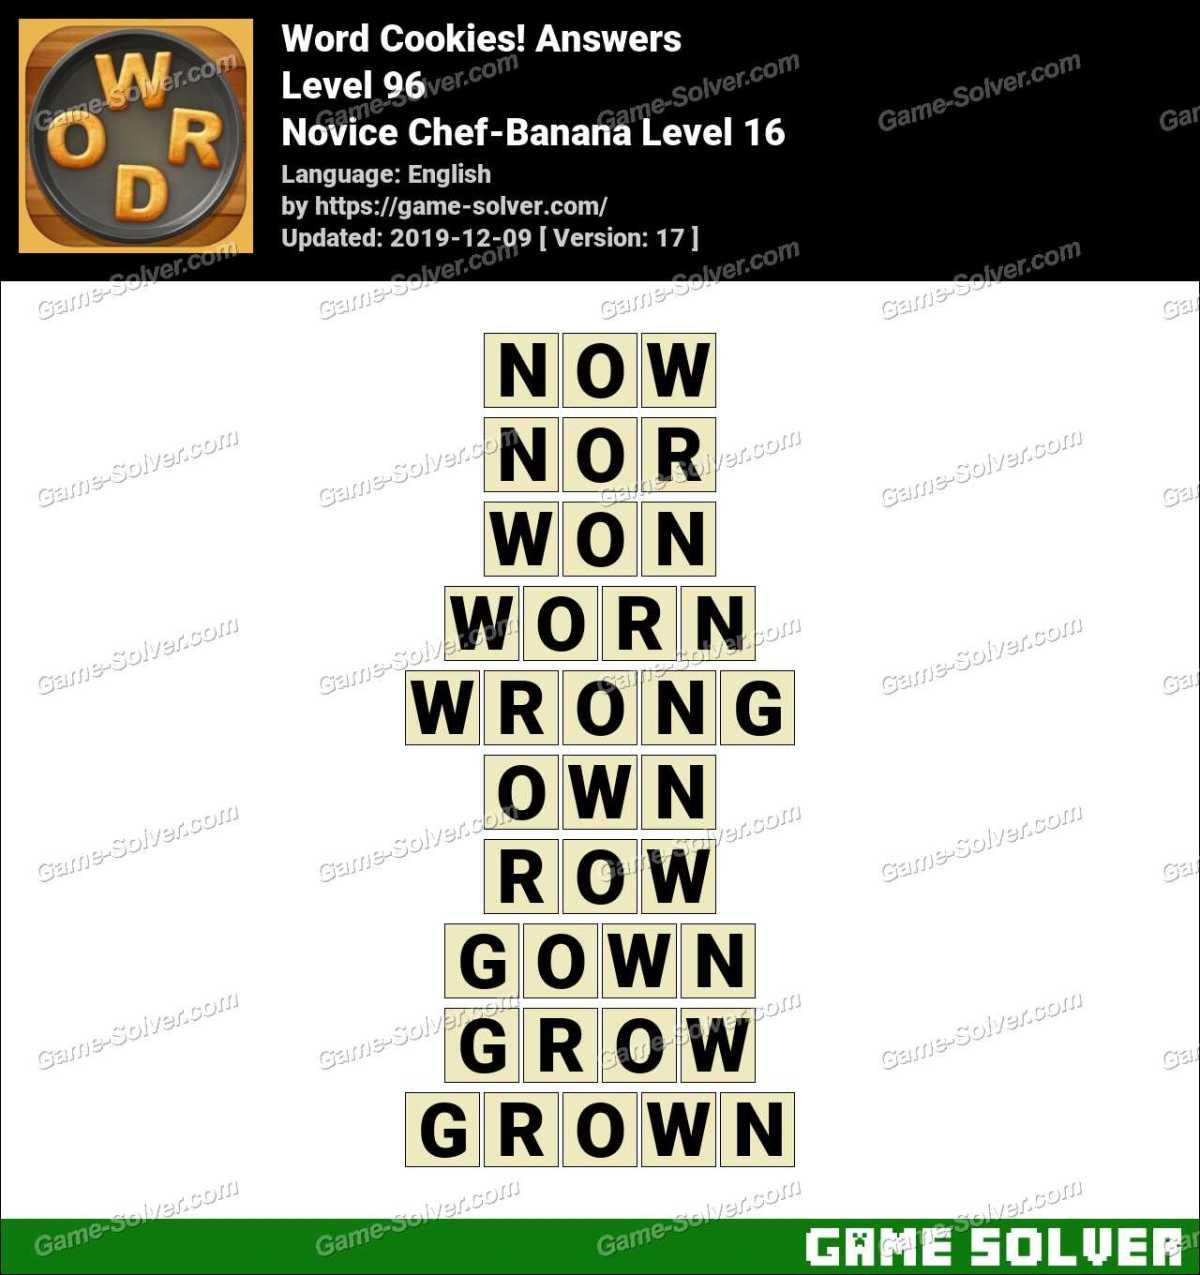 Word Cookies Novice Chef-Banana Level 16 Answers